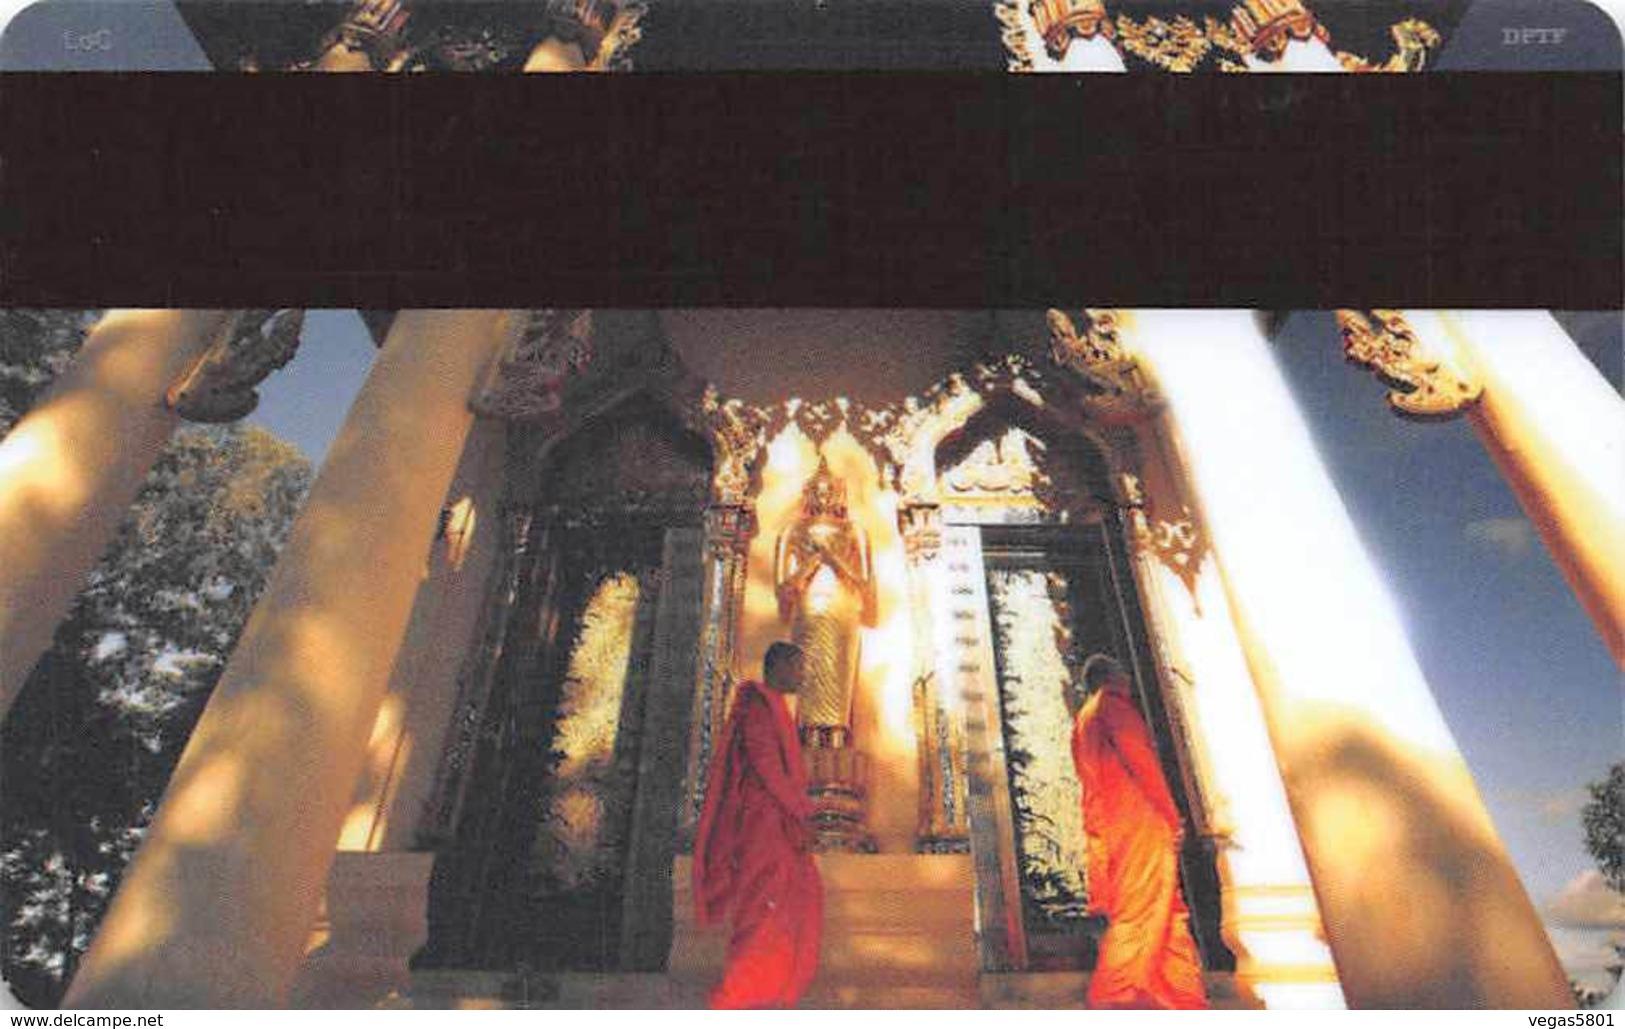 INTERCONTINENTAL - Bangkok, Thailand - Hotel Room Key Card, Hotelkarte, Schlüsselkarte, Clé De L'Hôtel - Hotelkarten